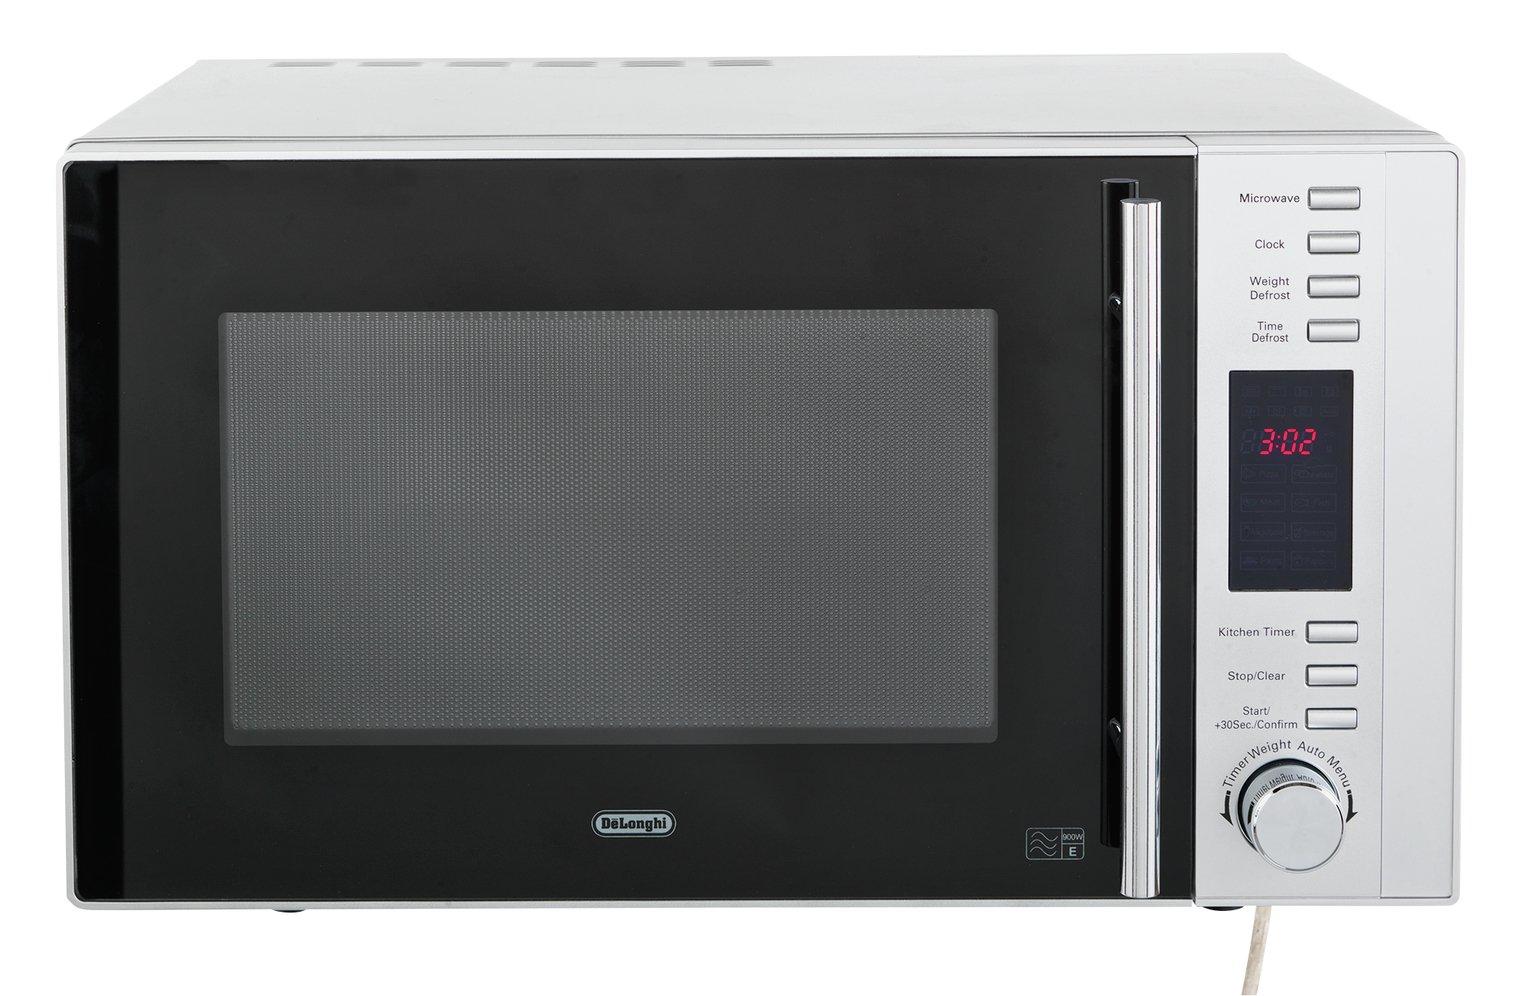 DeLonghi 900W Standard Microwave AM925EBL - Silver